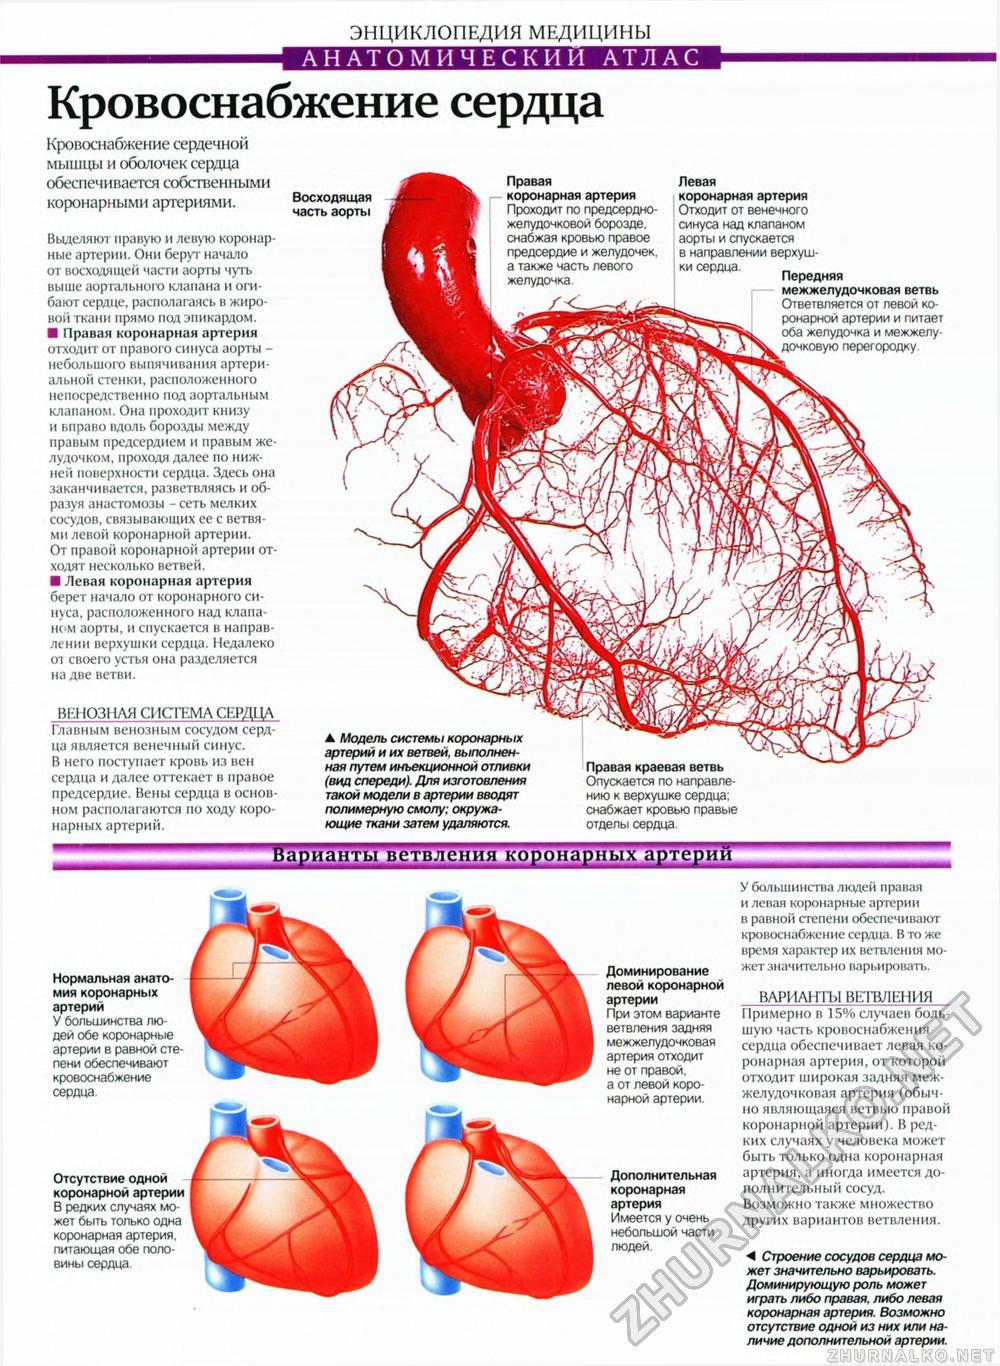 Схема коронарных артерий сердца человека